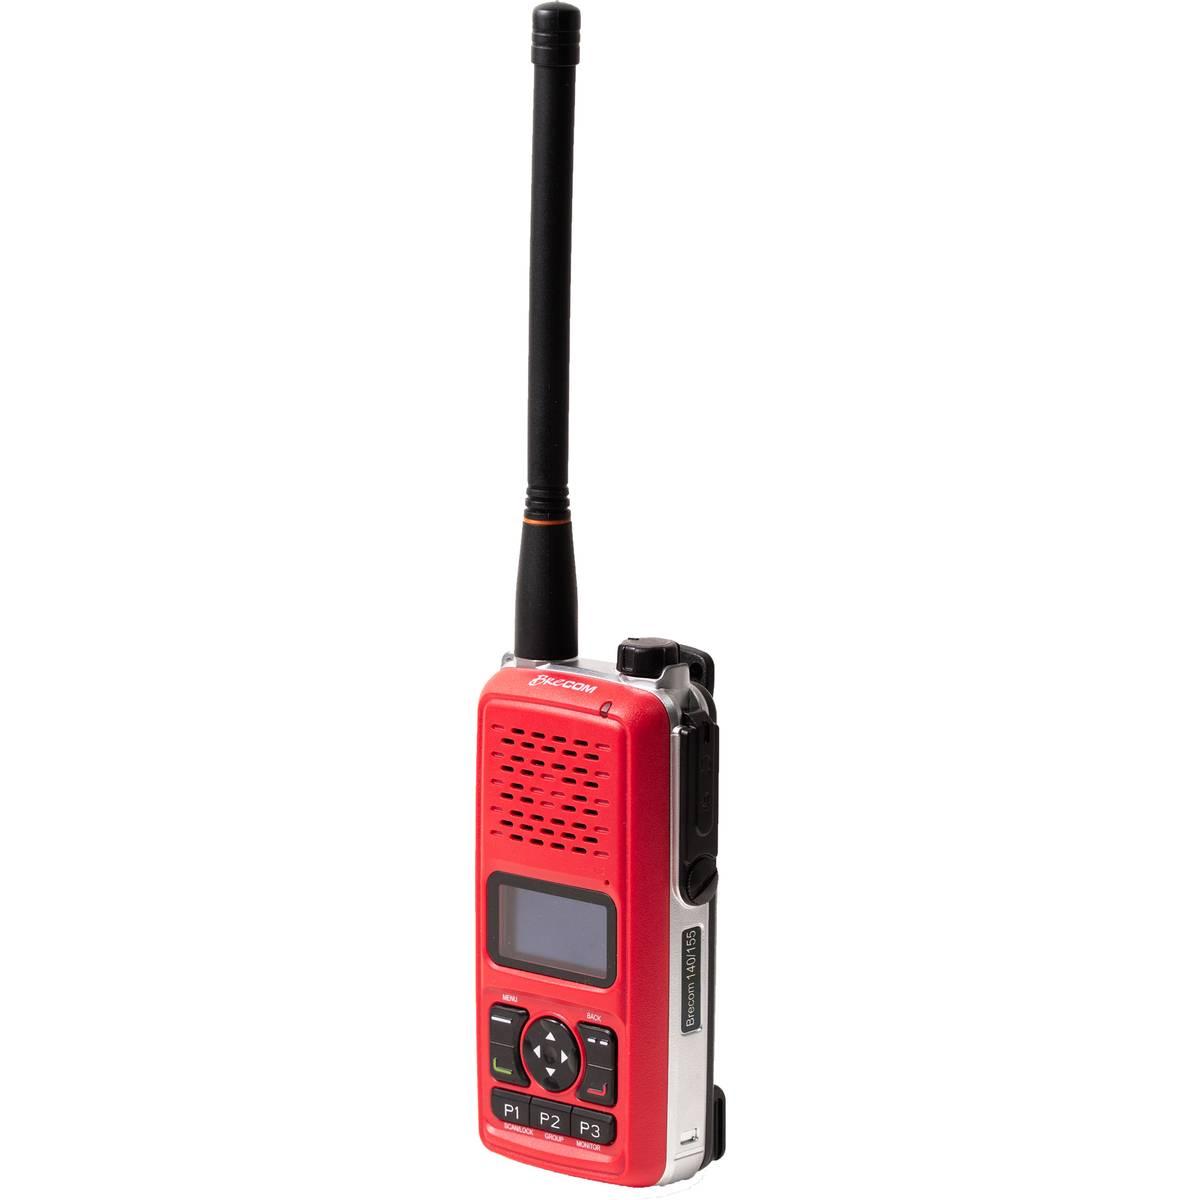 10003500- -Brecom VR-3500 analog/digital radio DMR 138-174Mhz